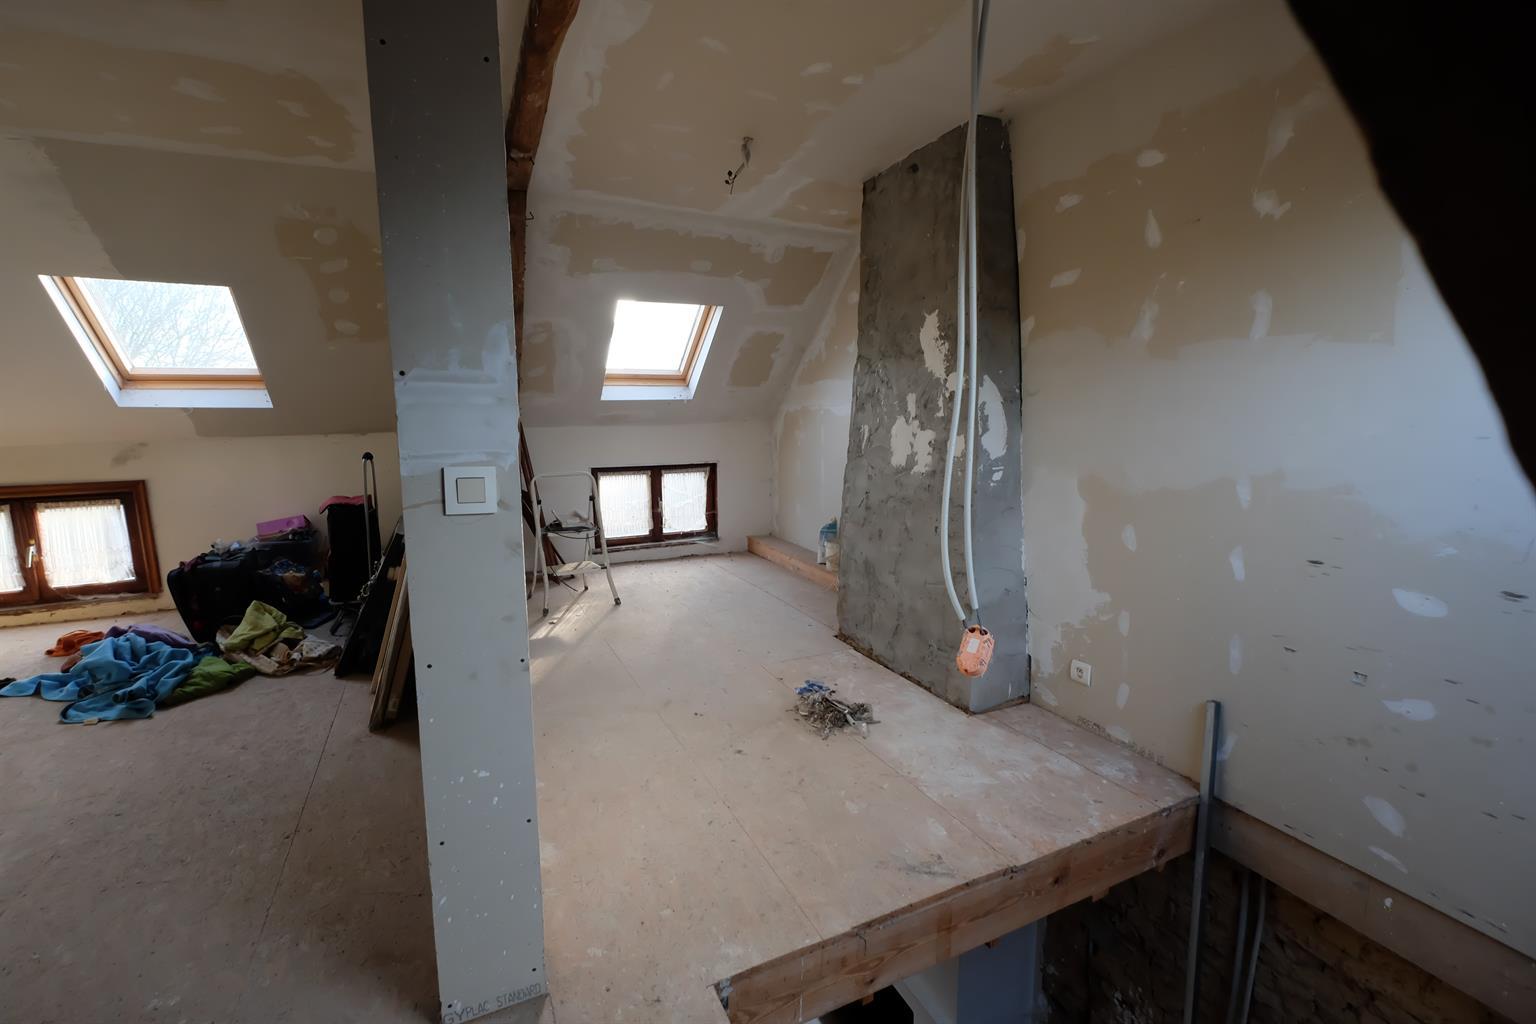 Maison - Tubize Oisquercq - #4252207-5